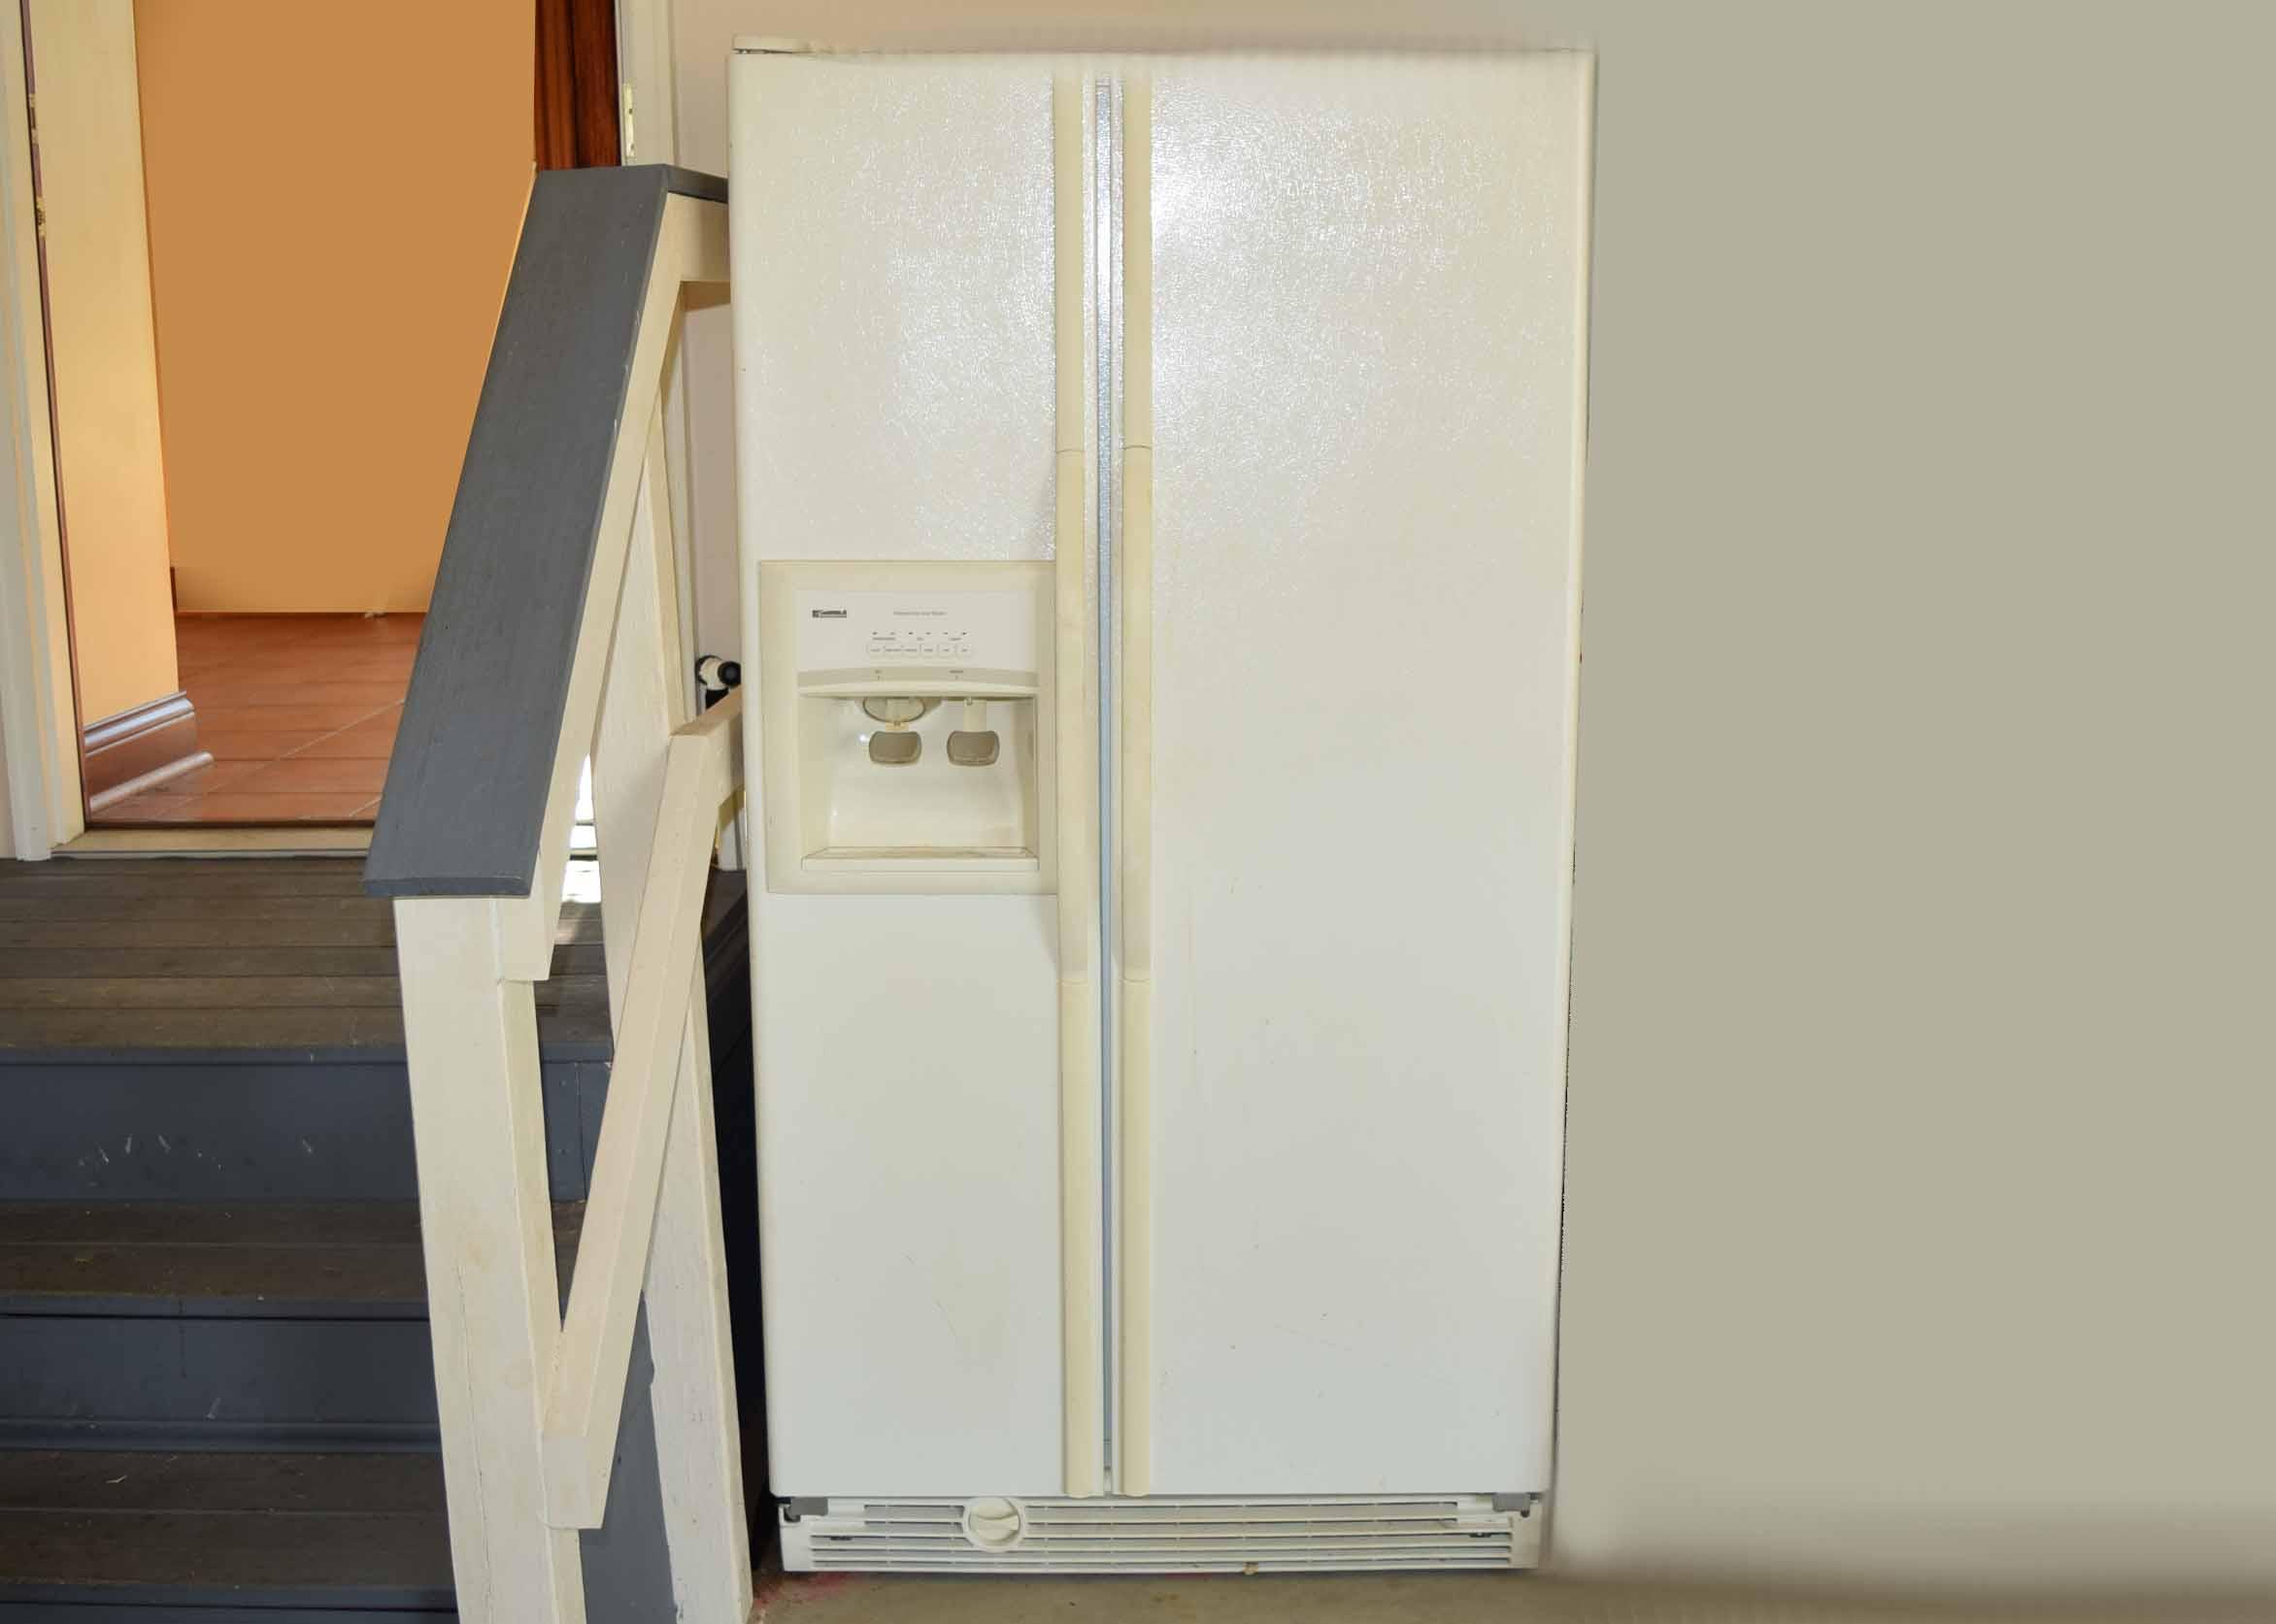 kenmore coldspot refrigerator. kenmore coldspot side-by-side refrigerator-freezer refrigerator